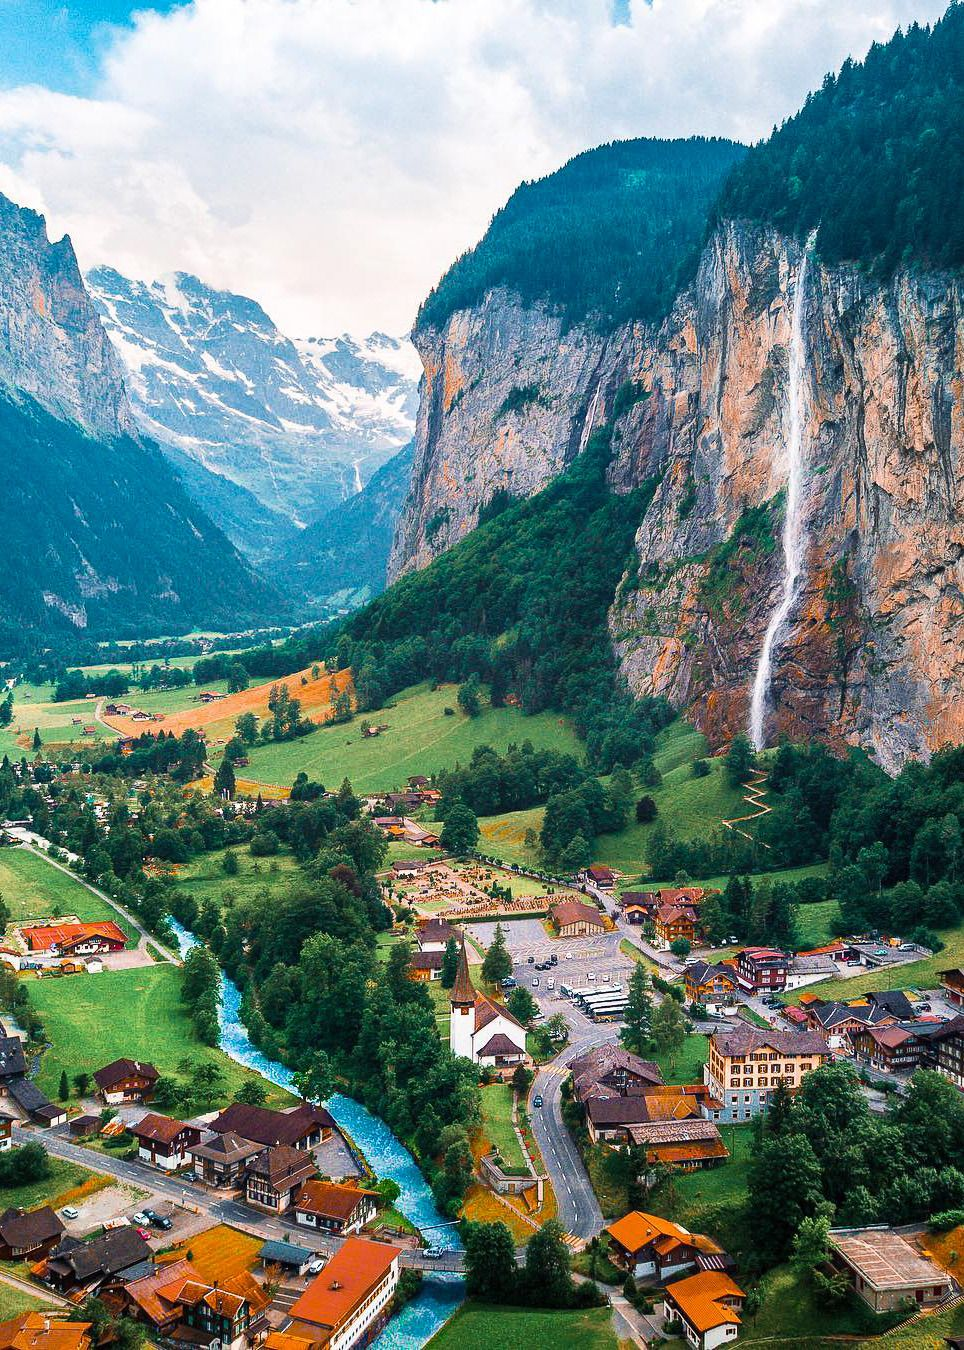 Coiour My World Lauterbrunnen Switzerland Mblockk Places